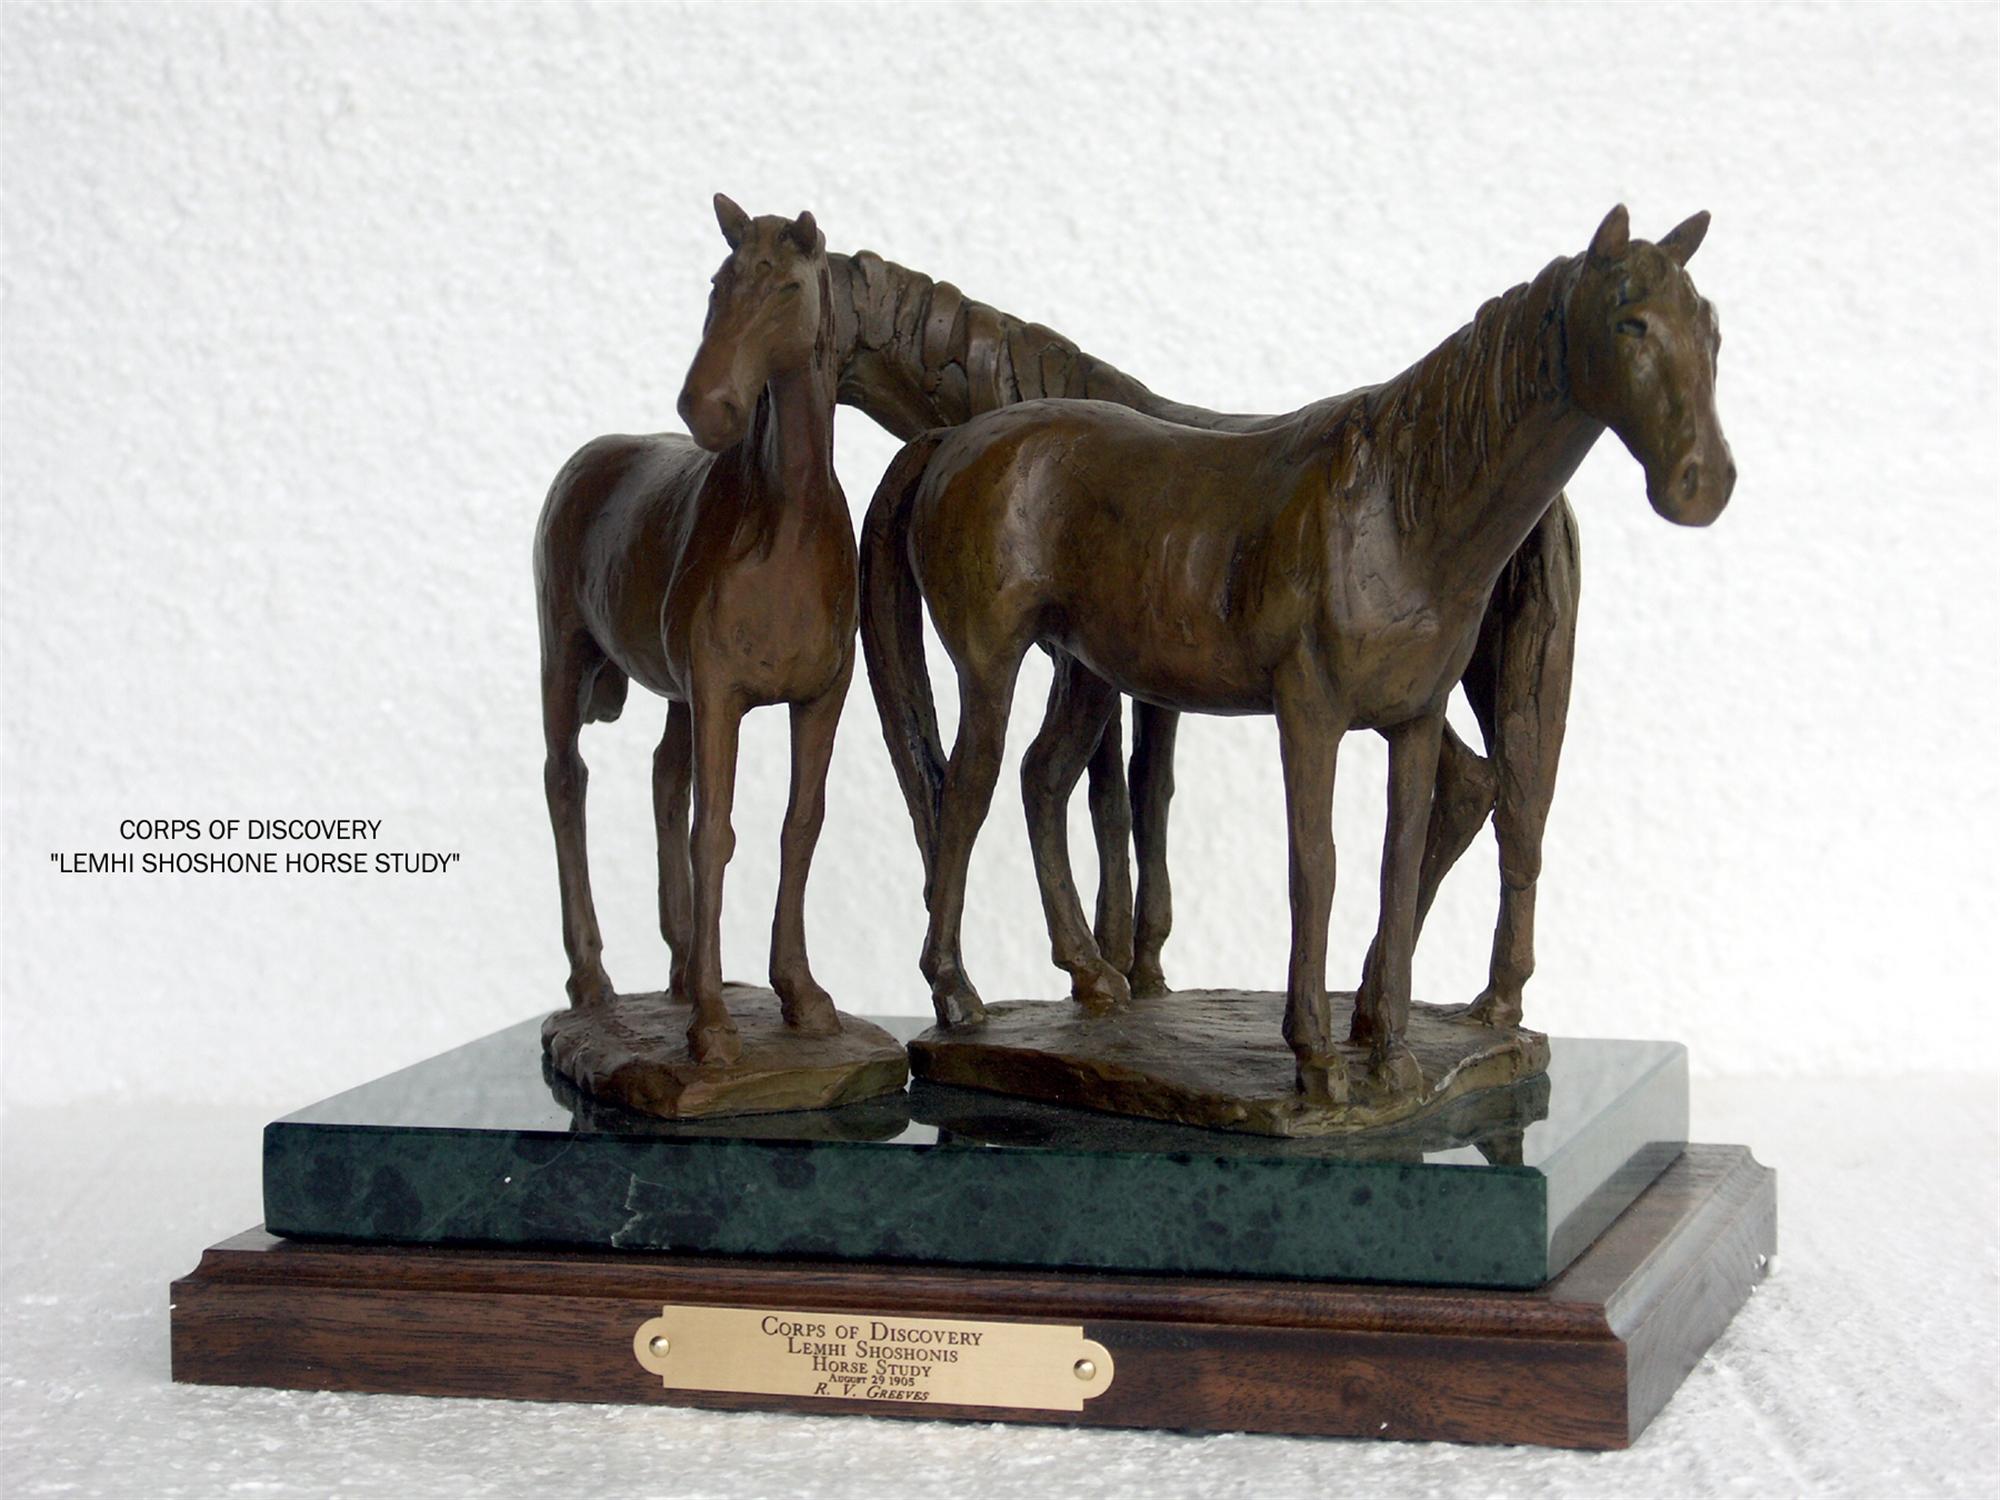 Lemhi Shoshone Horse Study by Richard Greeves